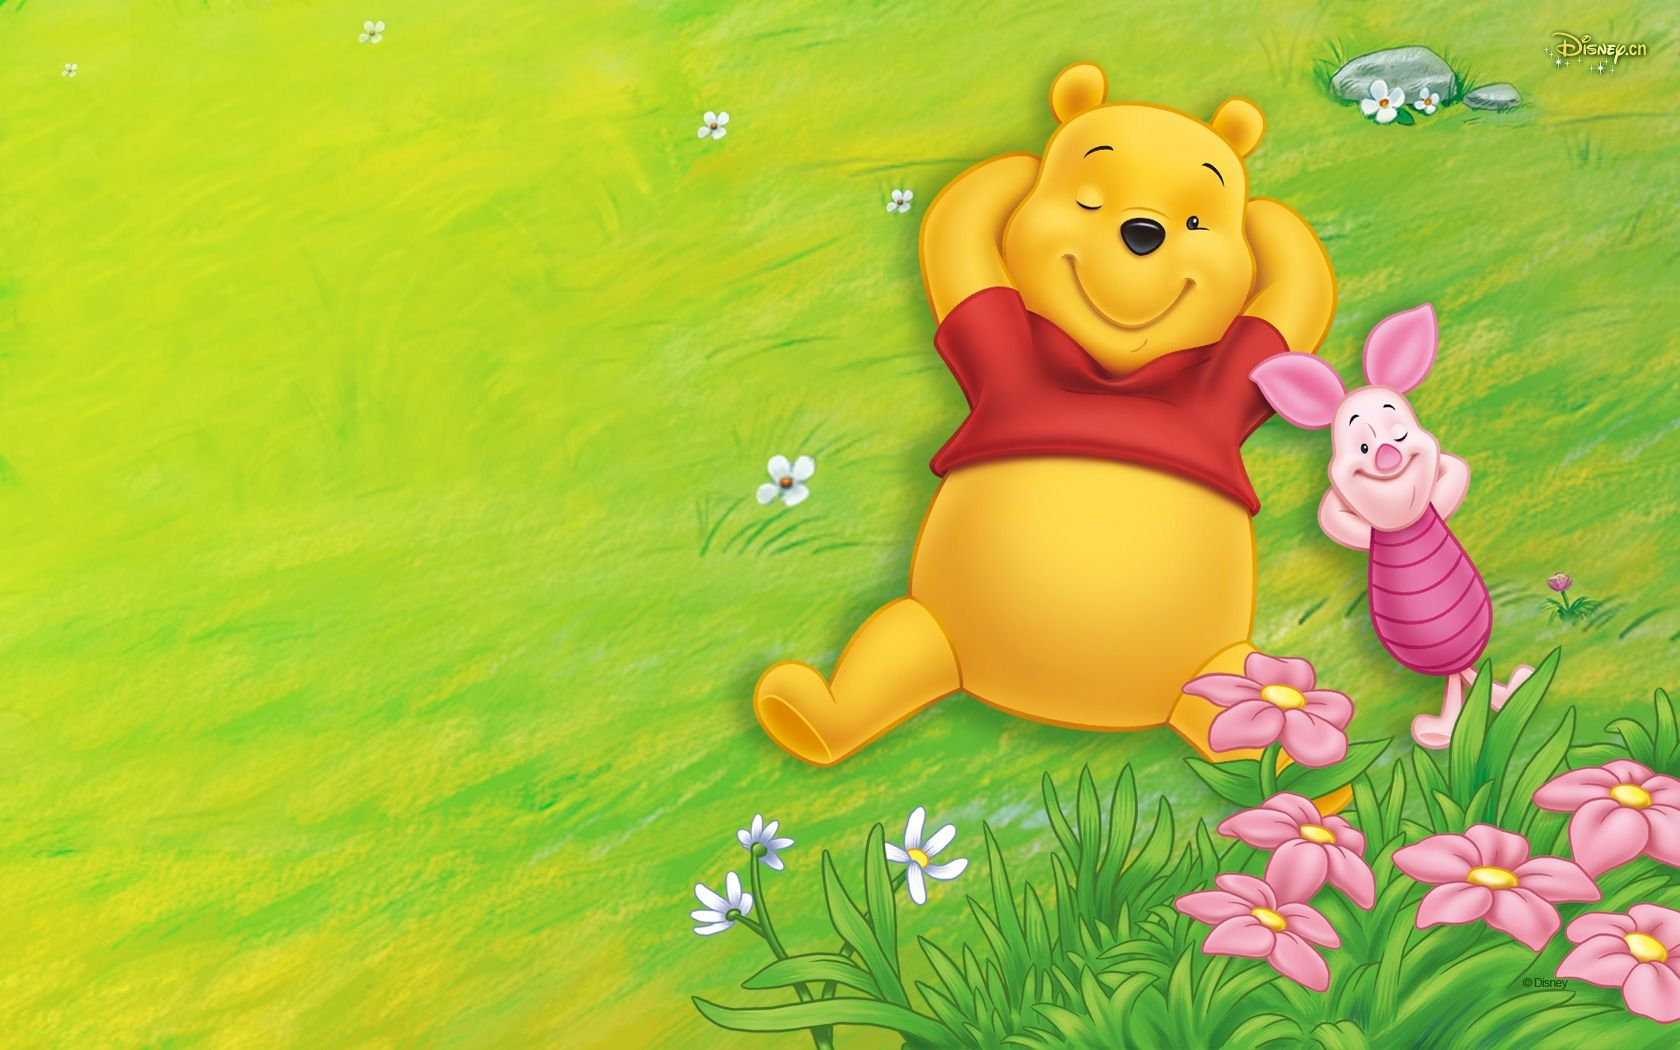 Winnie The Pooh The Book Of Pooh Stories From The Heart Winniethepooh Ebabytube Kidsvideo Http Www Ebabytube Com Wallpaper Disney Binatang Lucu Binatang